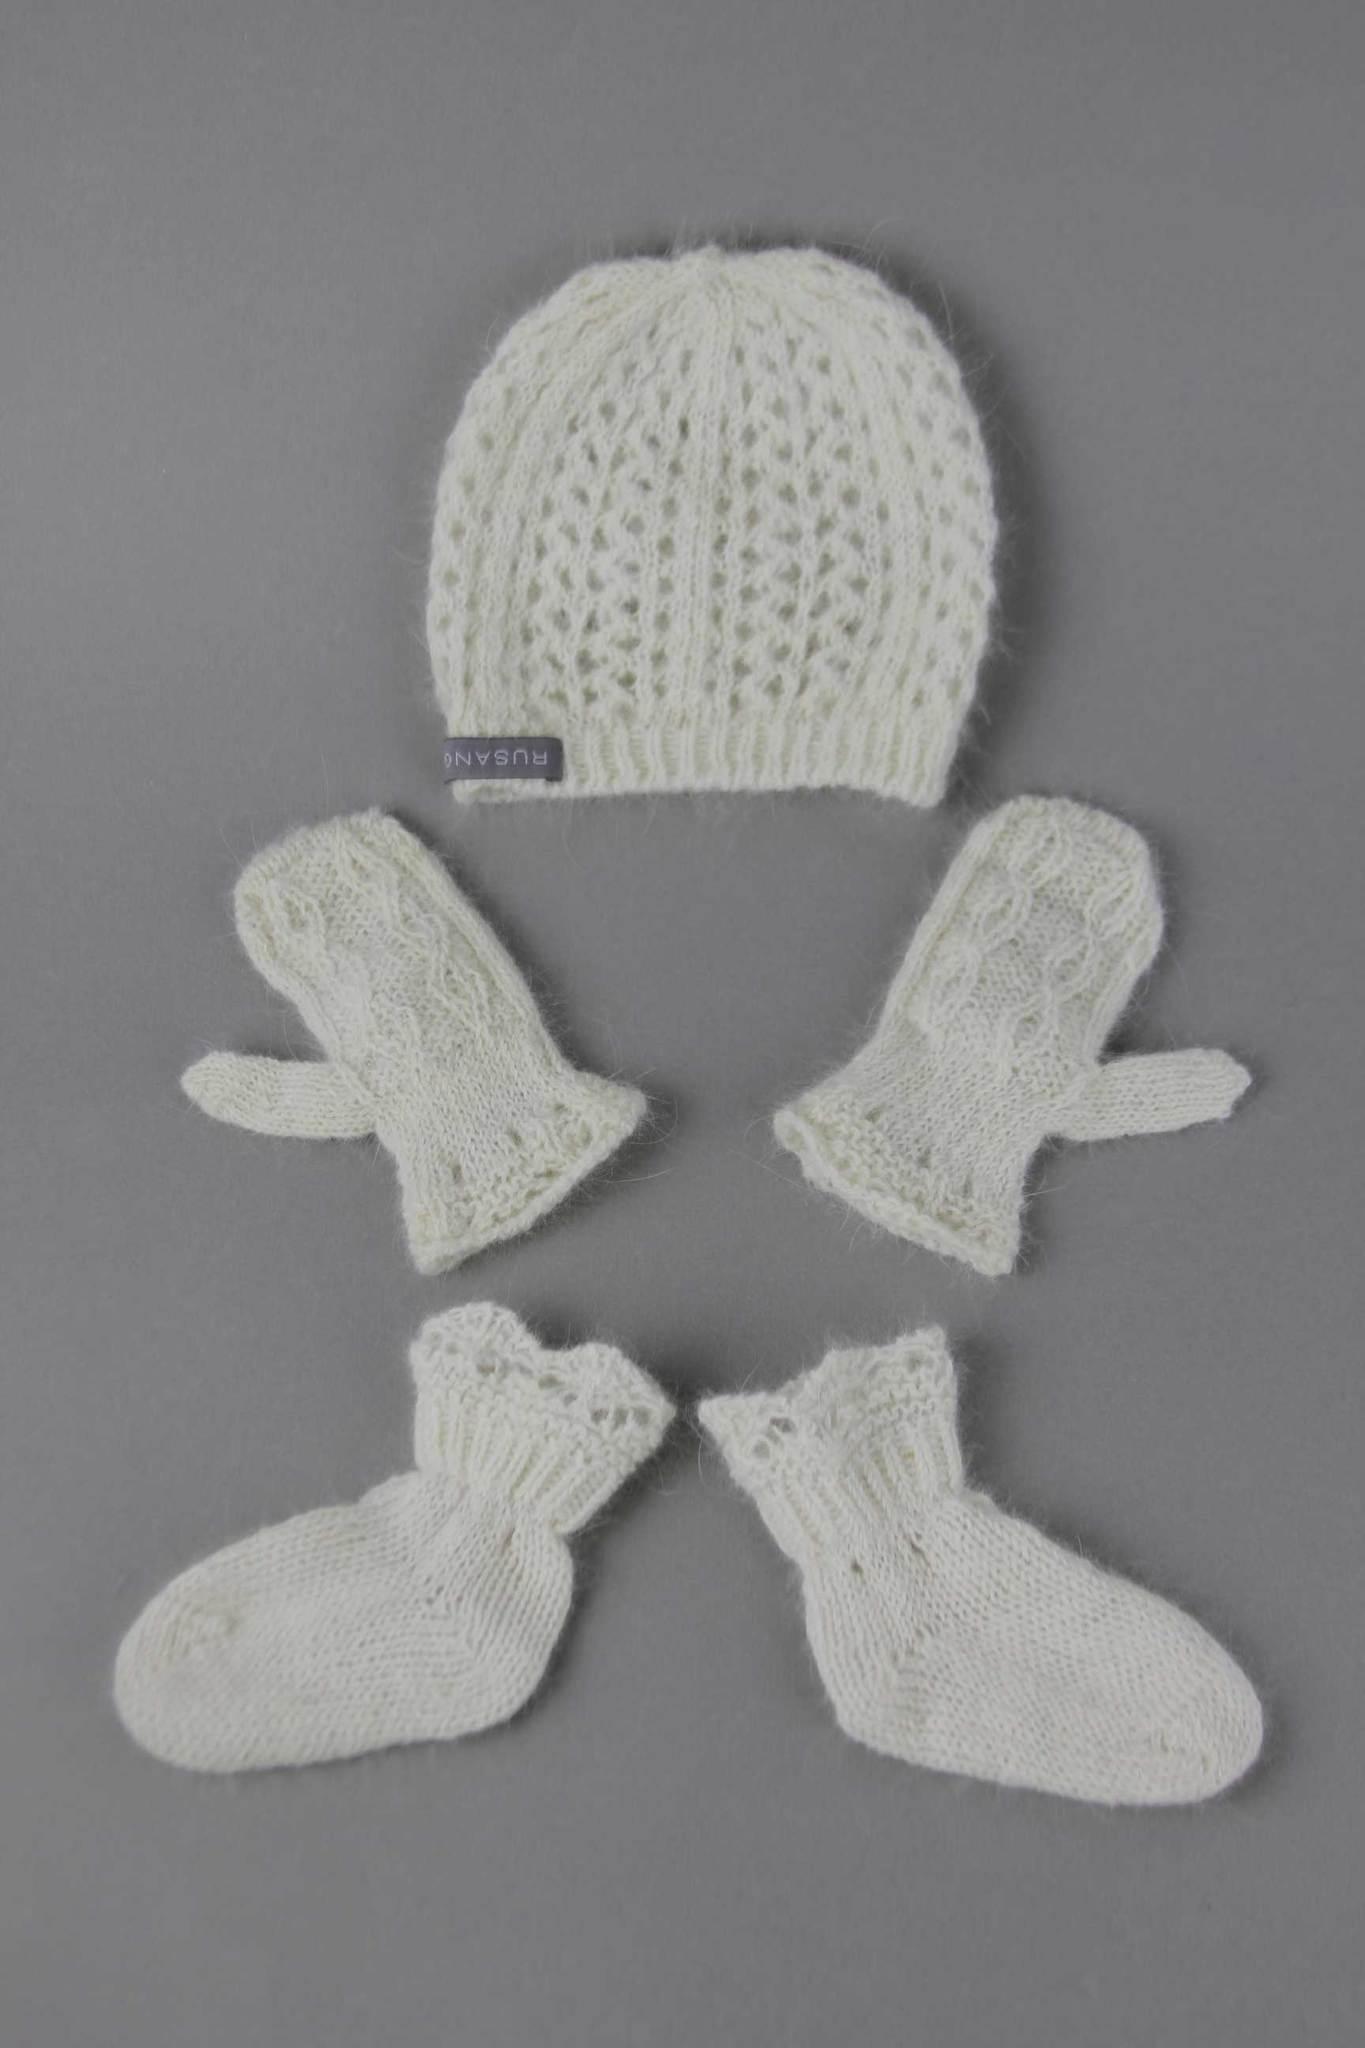 Newborn_angora_kit_3_pieces_white